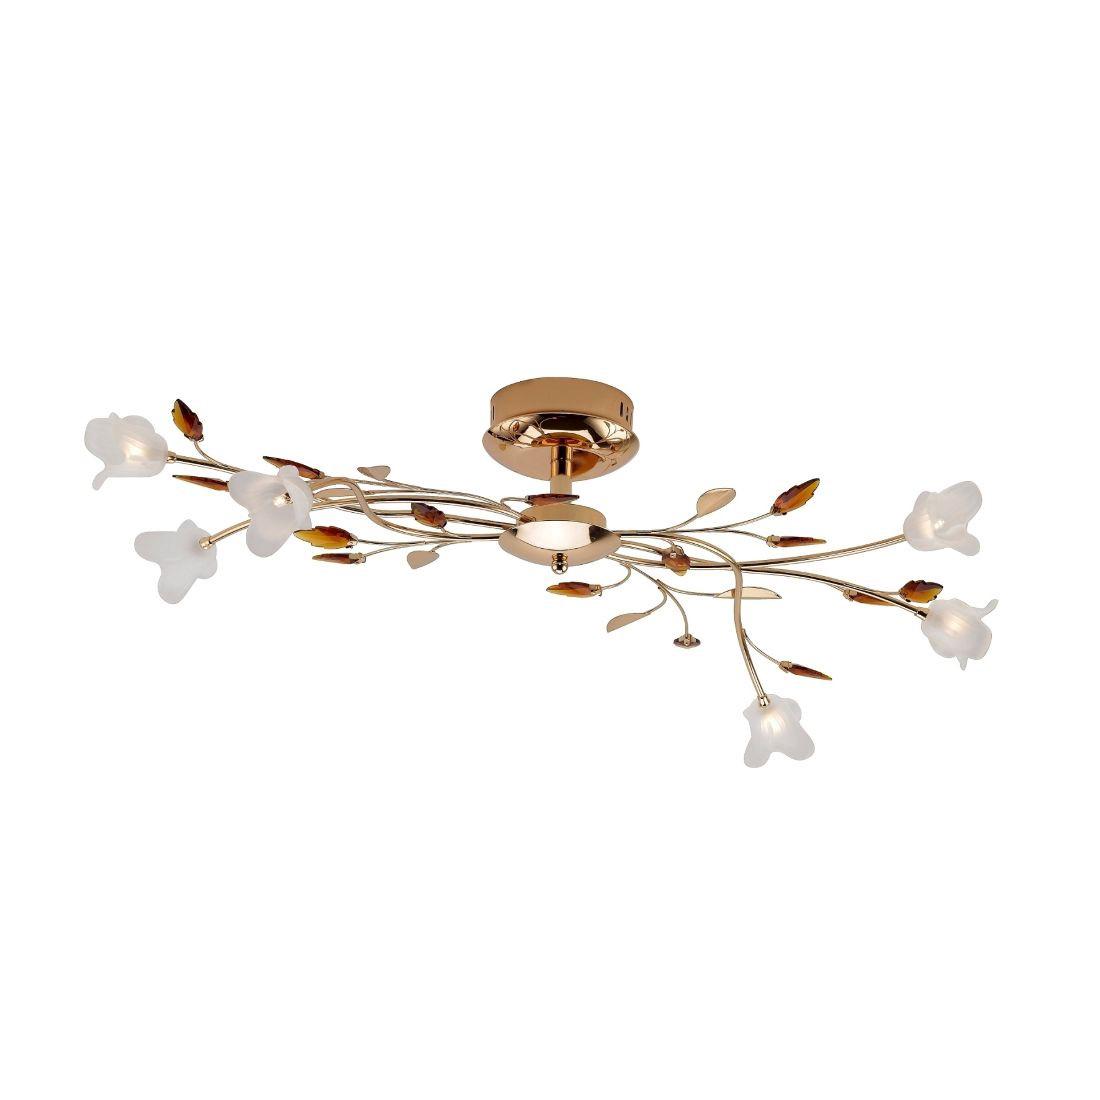 EEK B, Deckenleuchte Nevia – 6-flammig, florales Design – Metall, Glas – Gold, Weiß, Paul Neuhaus bestellen